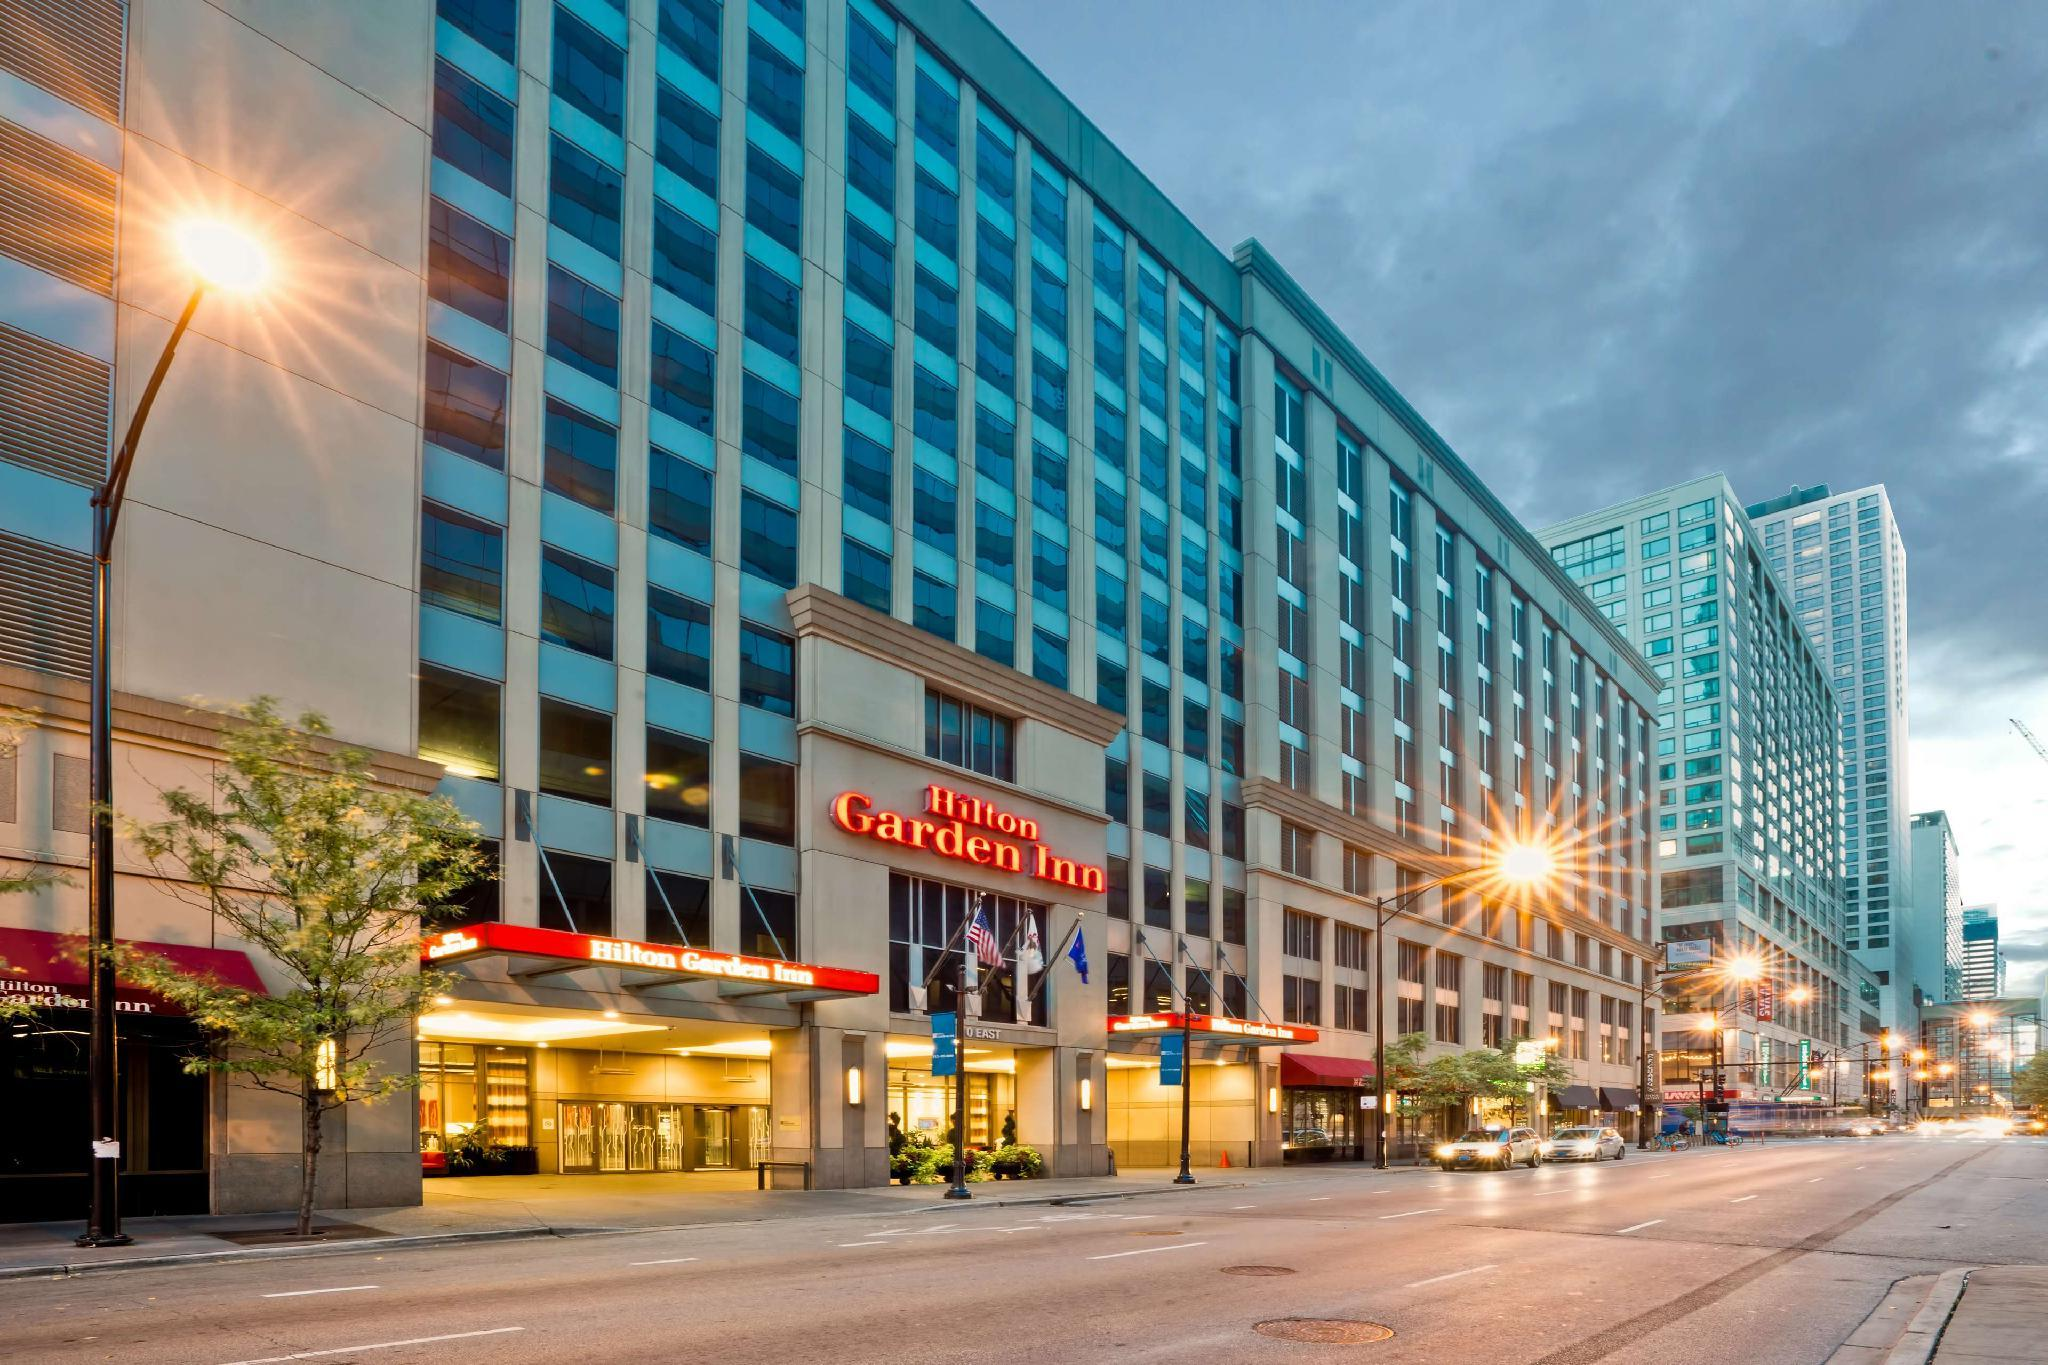 Hilton Garden Inn Chicago Downtown Magnificent Mile